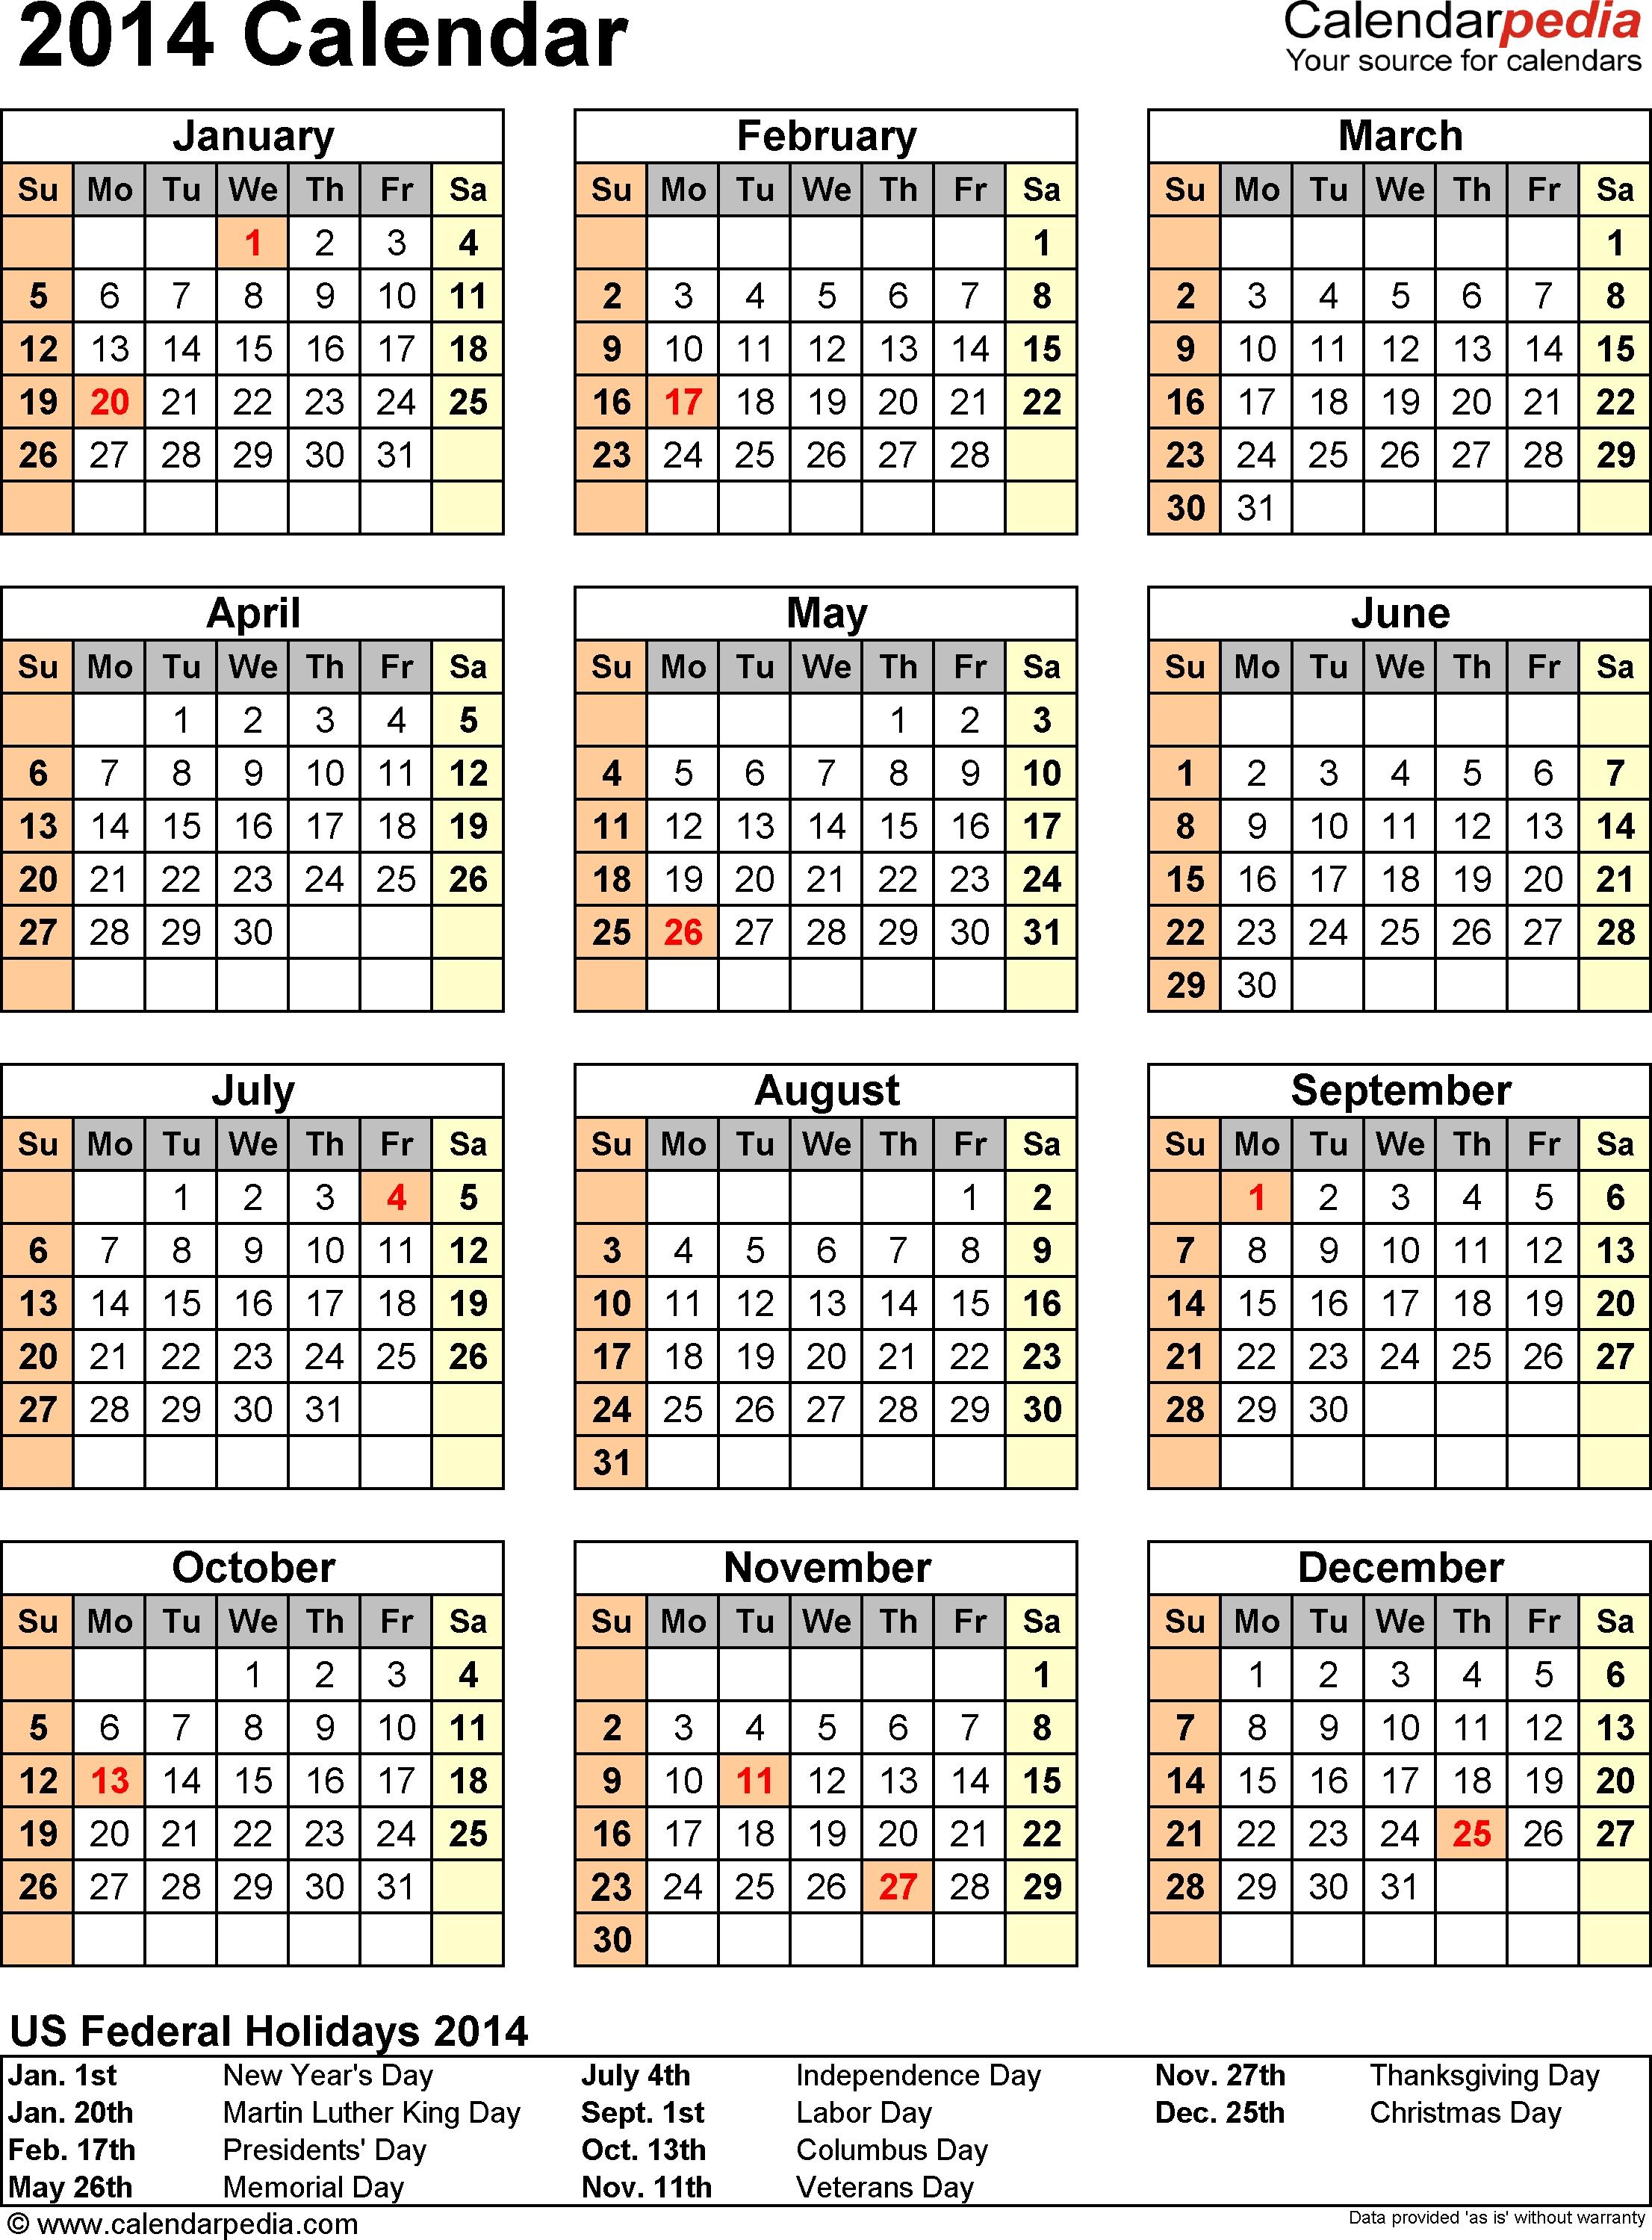 2014 Calendar - 13 Free Printable Word Calendar Templates  2014 Calendar Printable Full Page